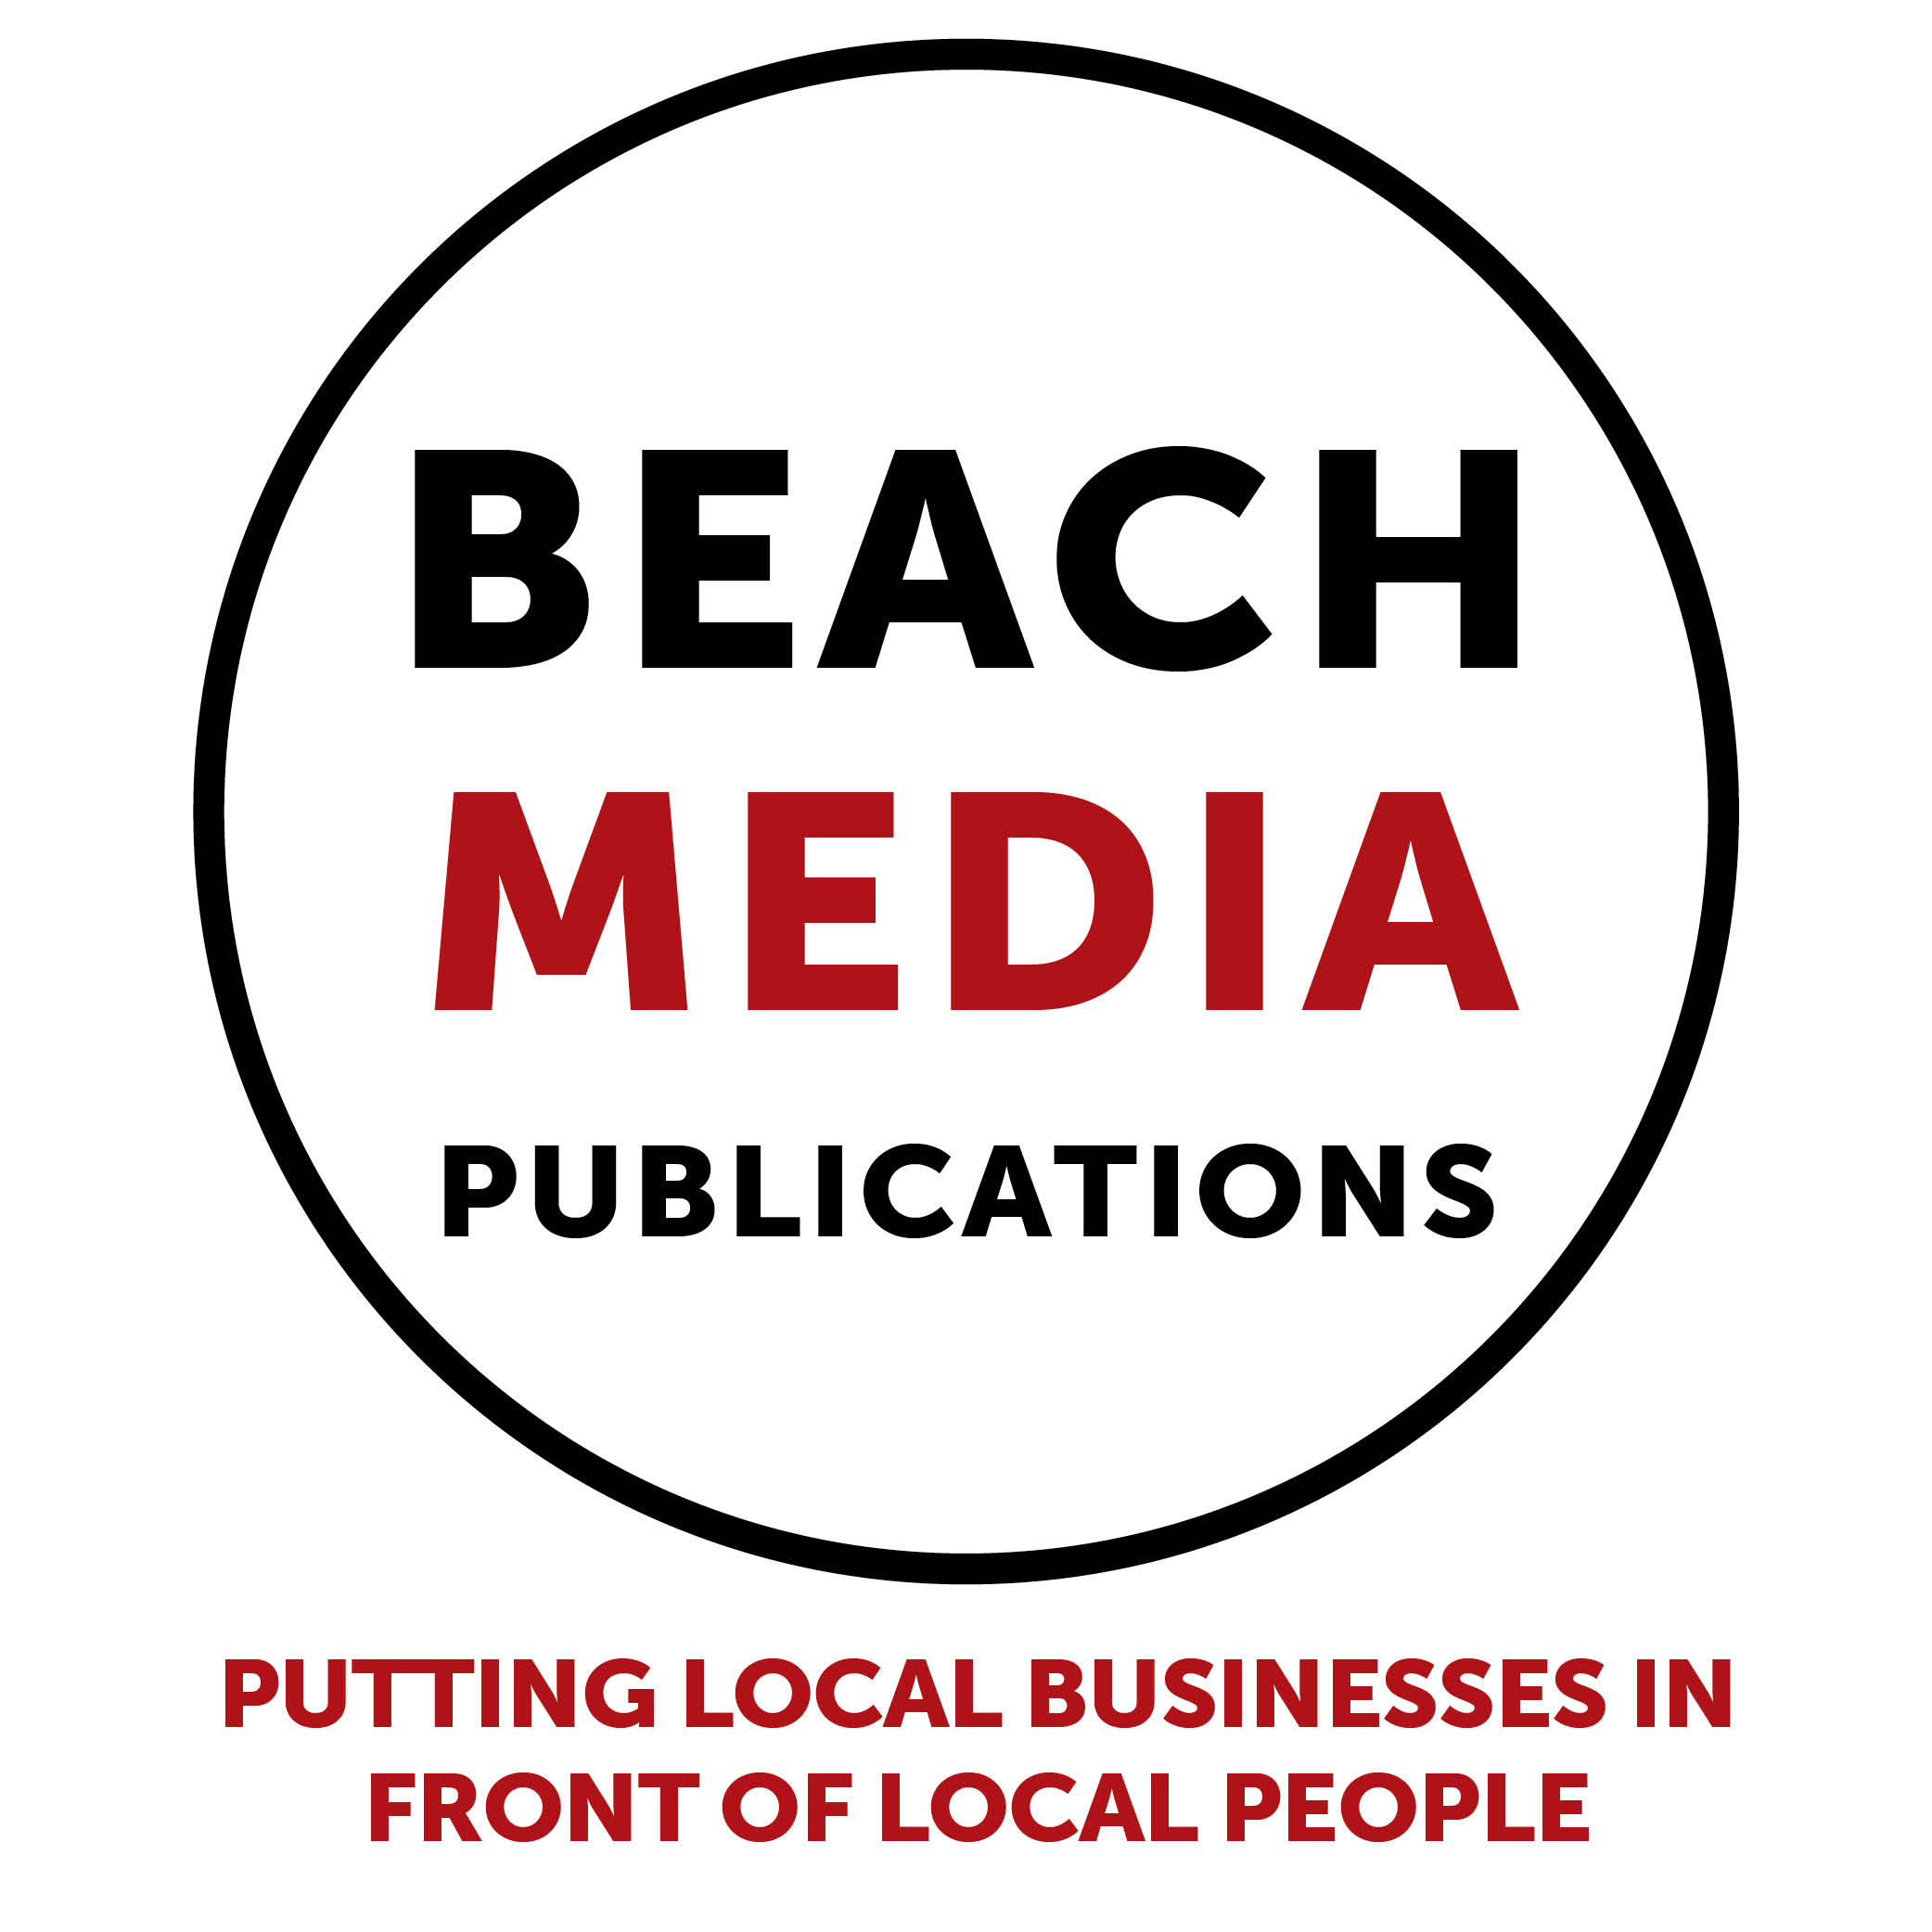 Beach Media Publications